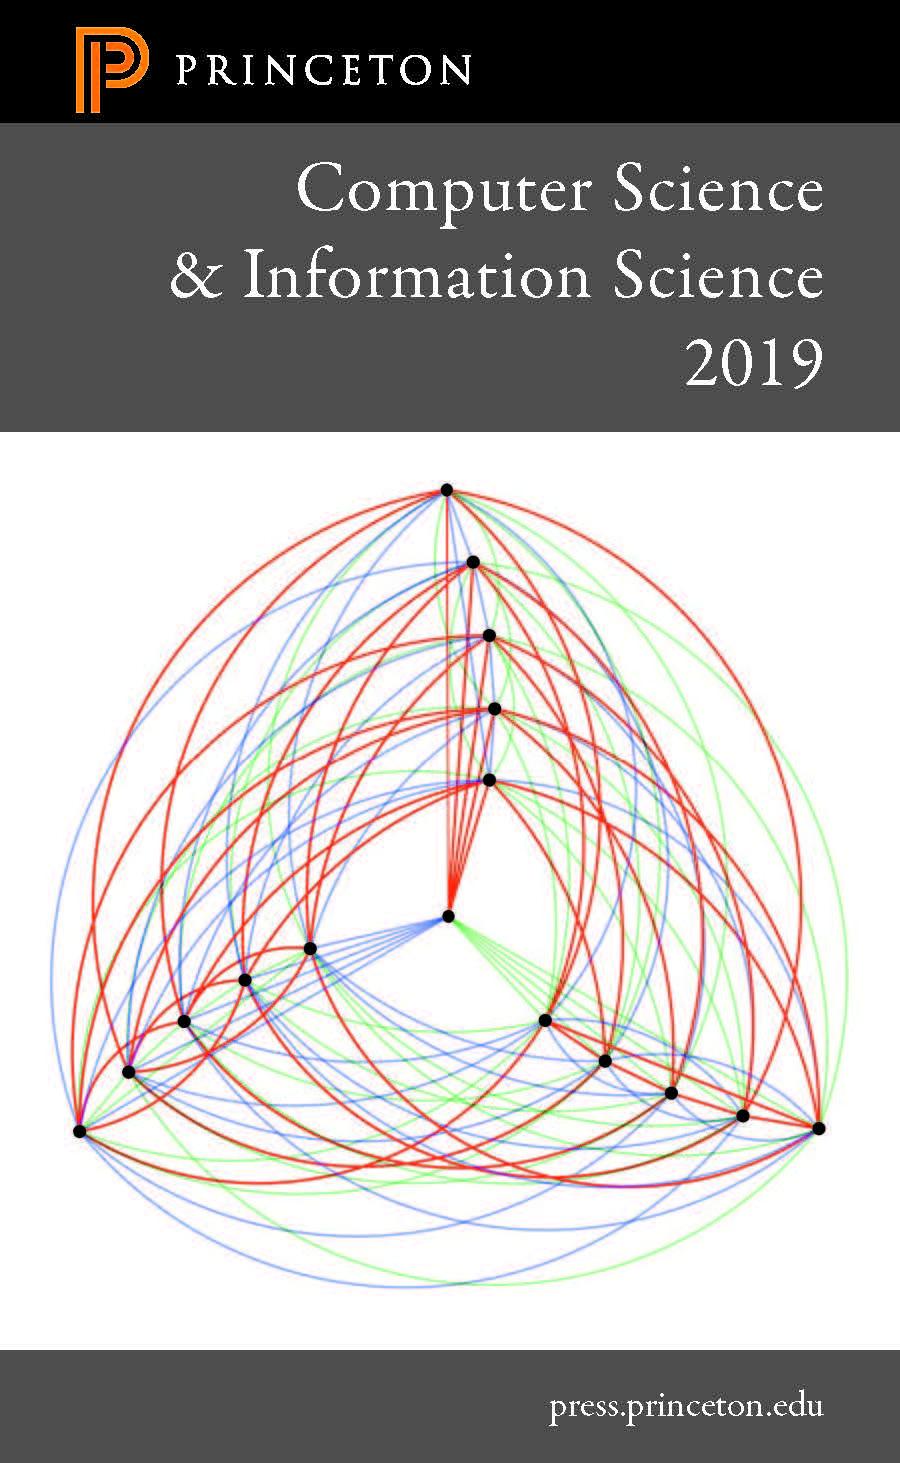 Computer Science & Information Science 2019 Catalog